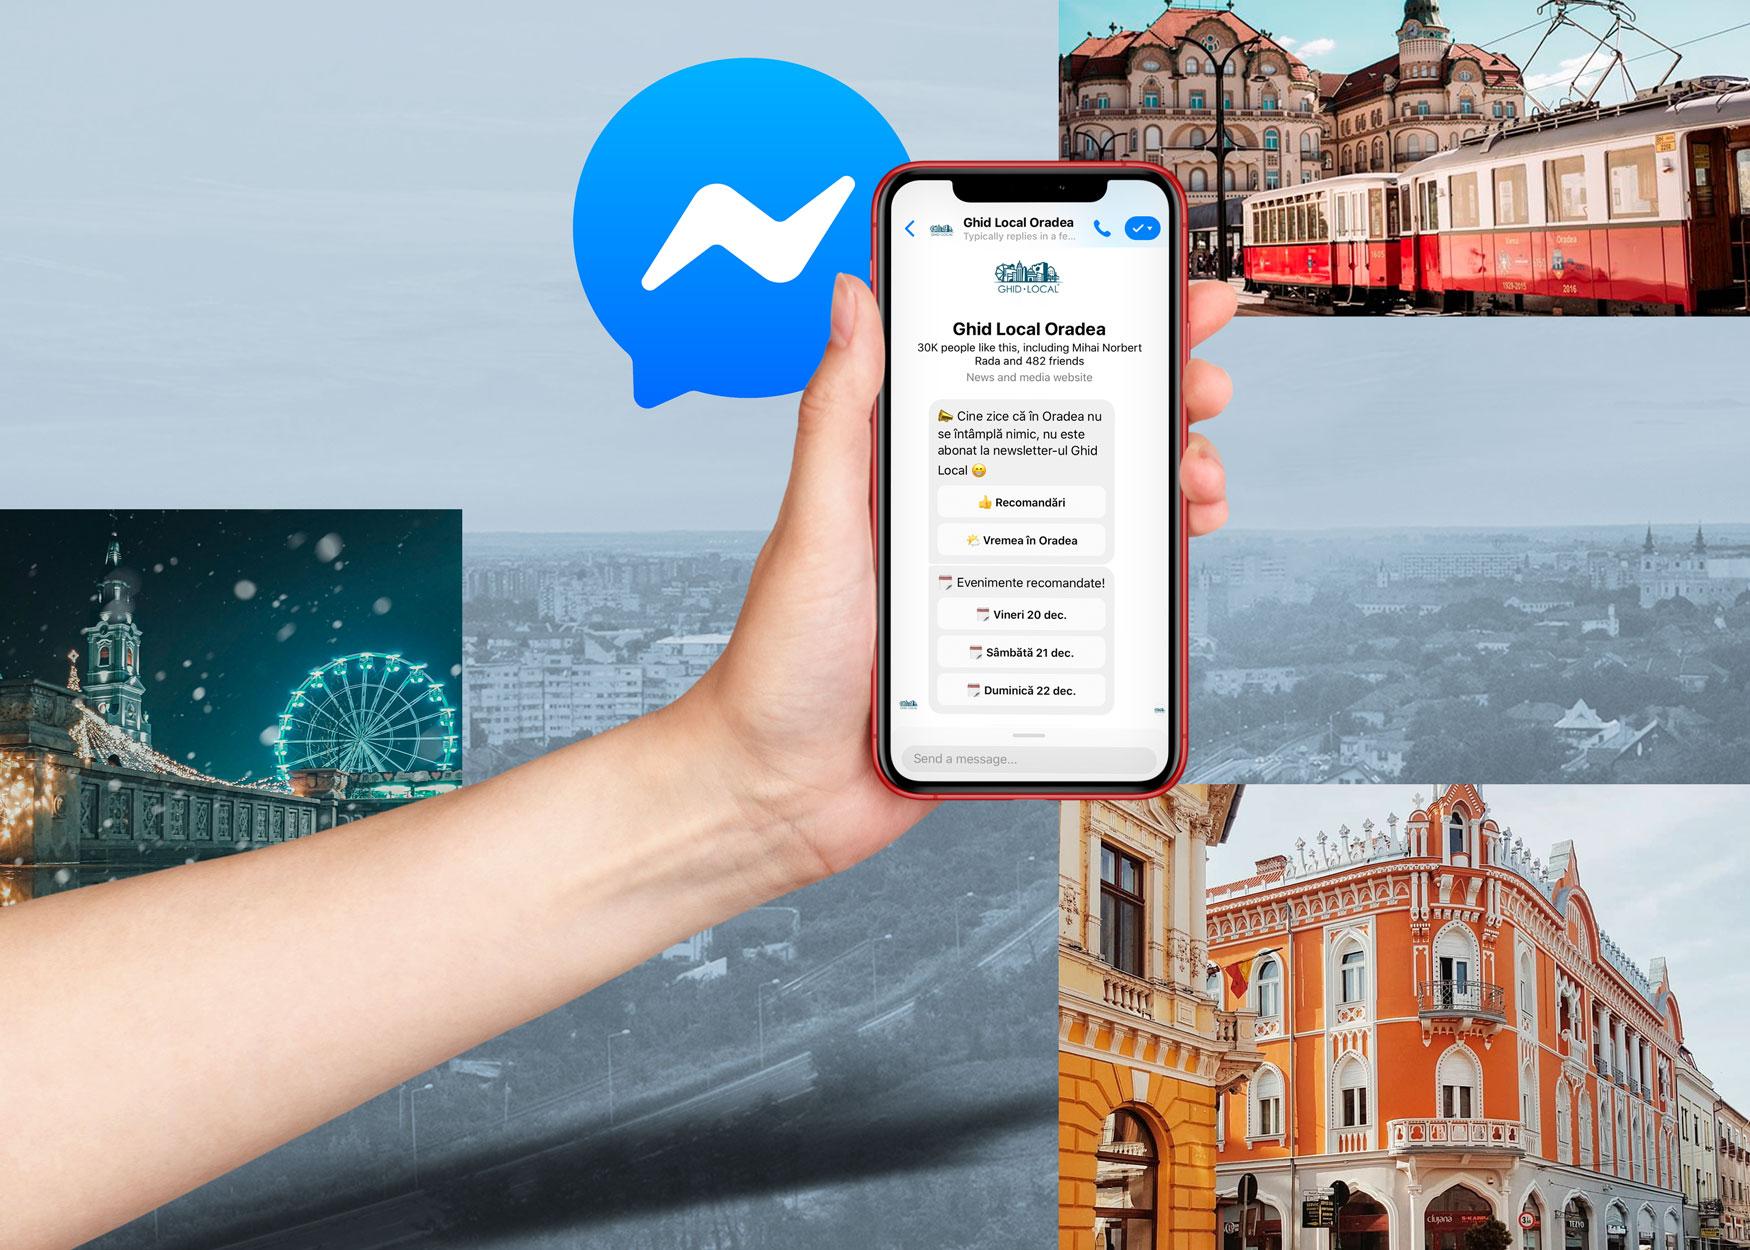 Ghid-Local-Oradea-chat-articol